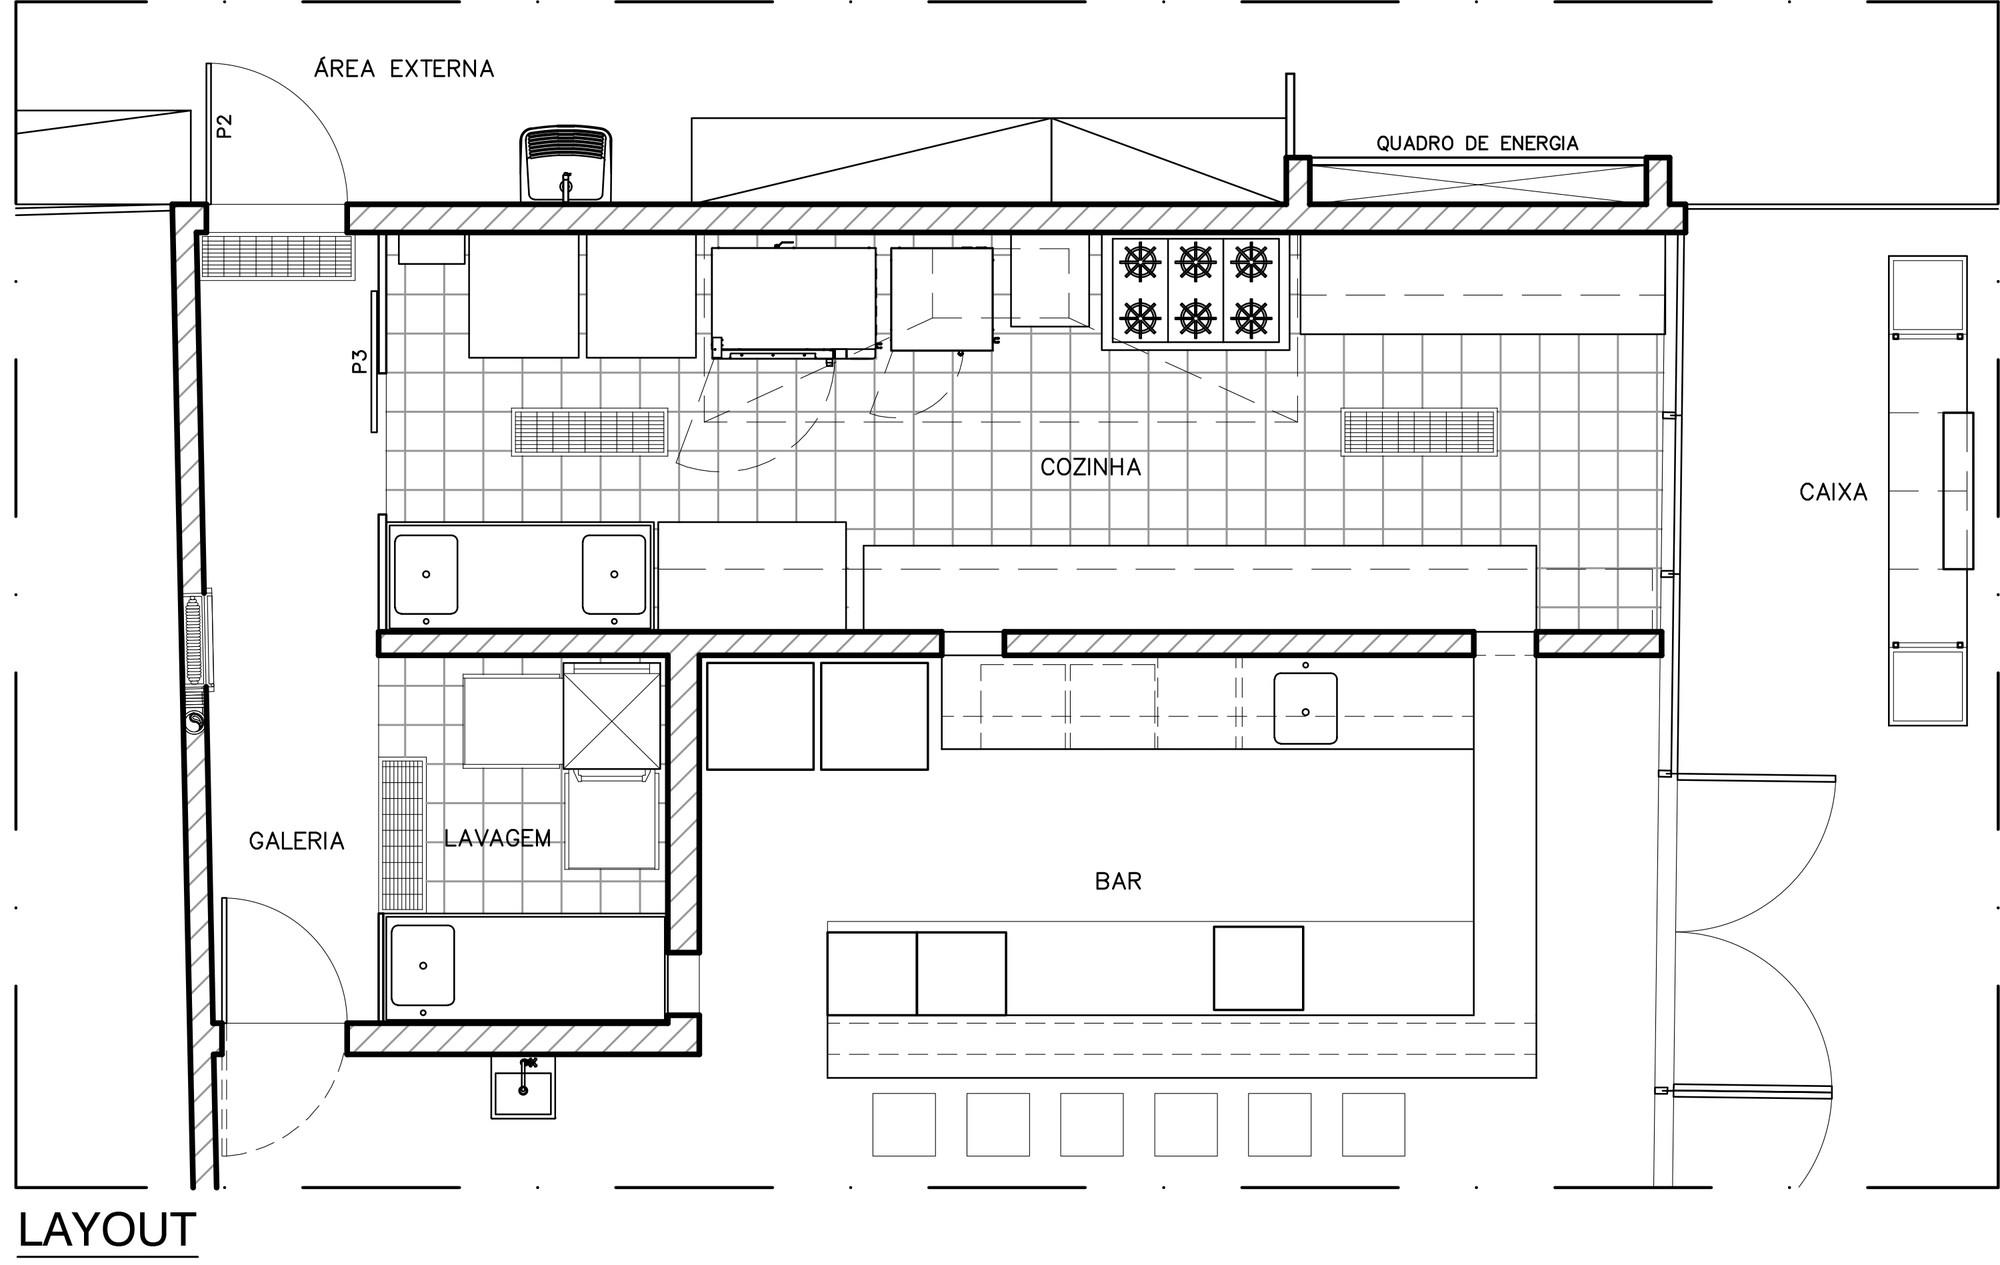 Bistrô Bom Demais / Semerene Arquitetura Interior ArchDaily Brasil #3F3F3F 2000 1265